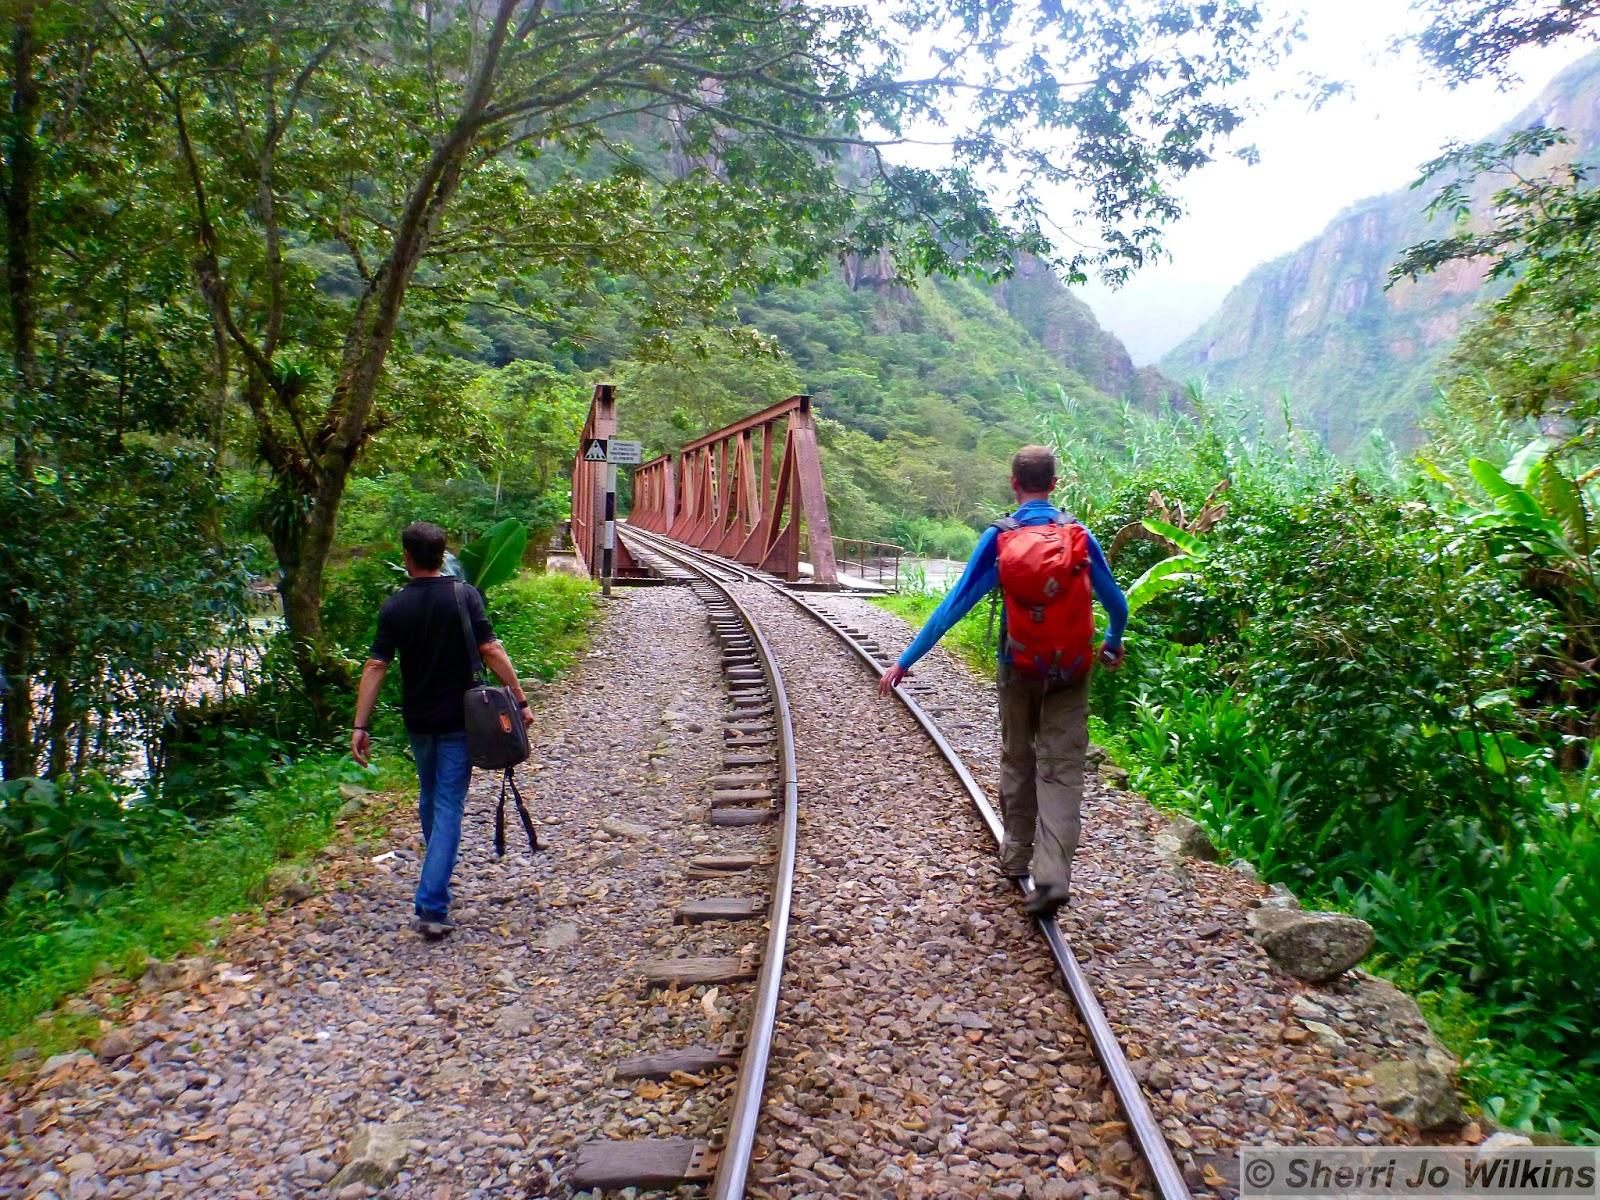 Afbeeldingsresultaat voor walk along railroad to aguas cal peru